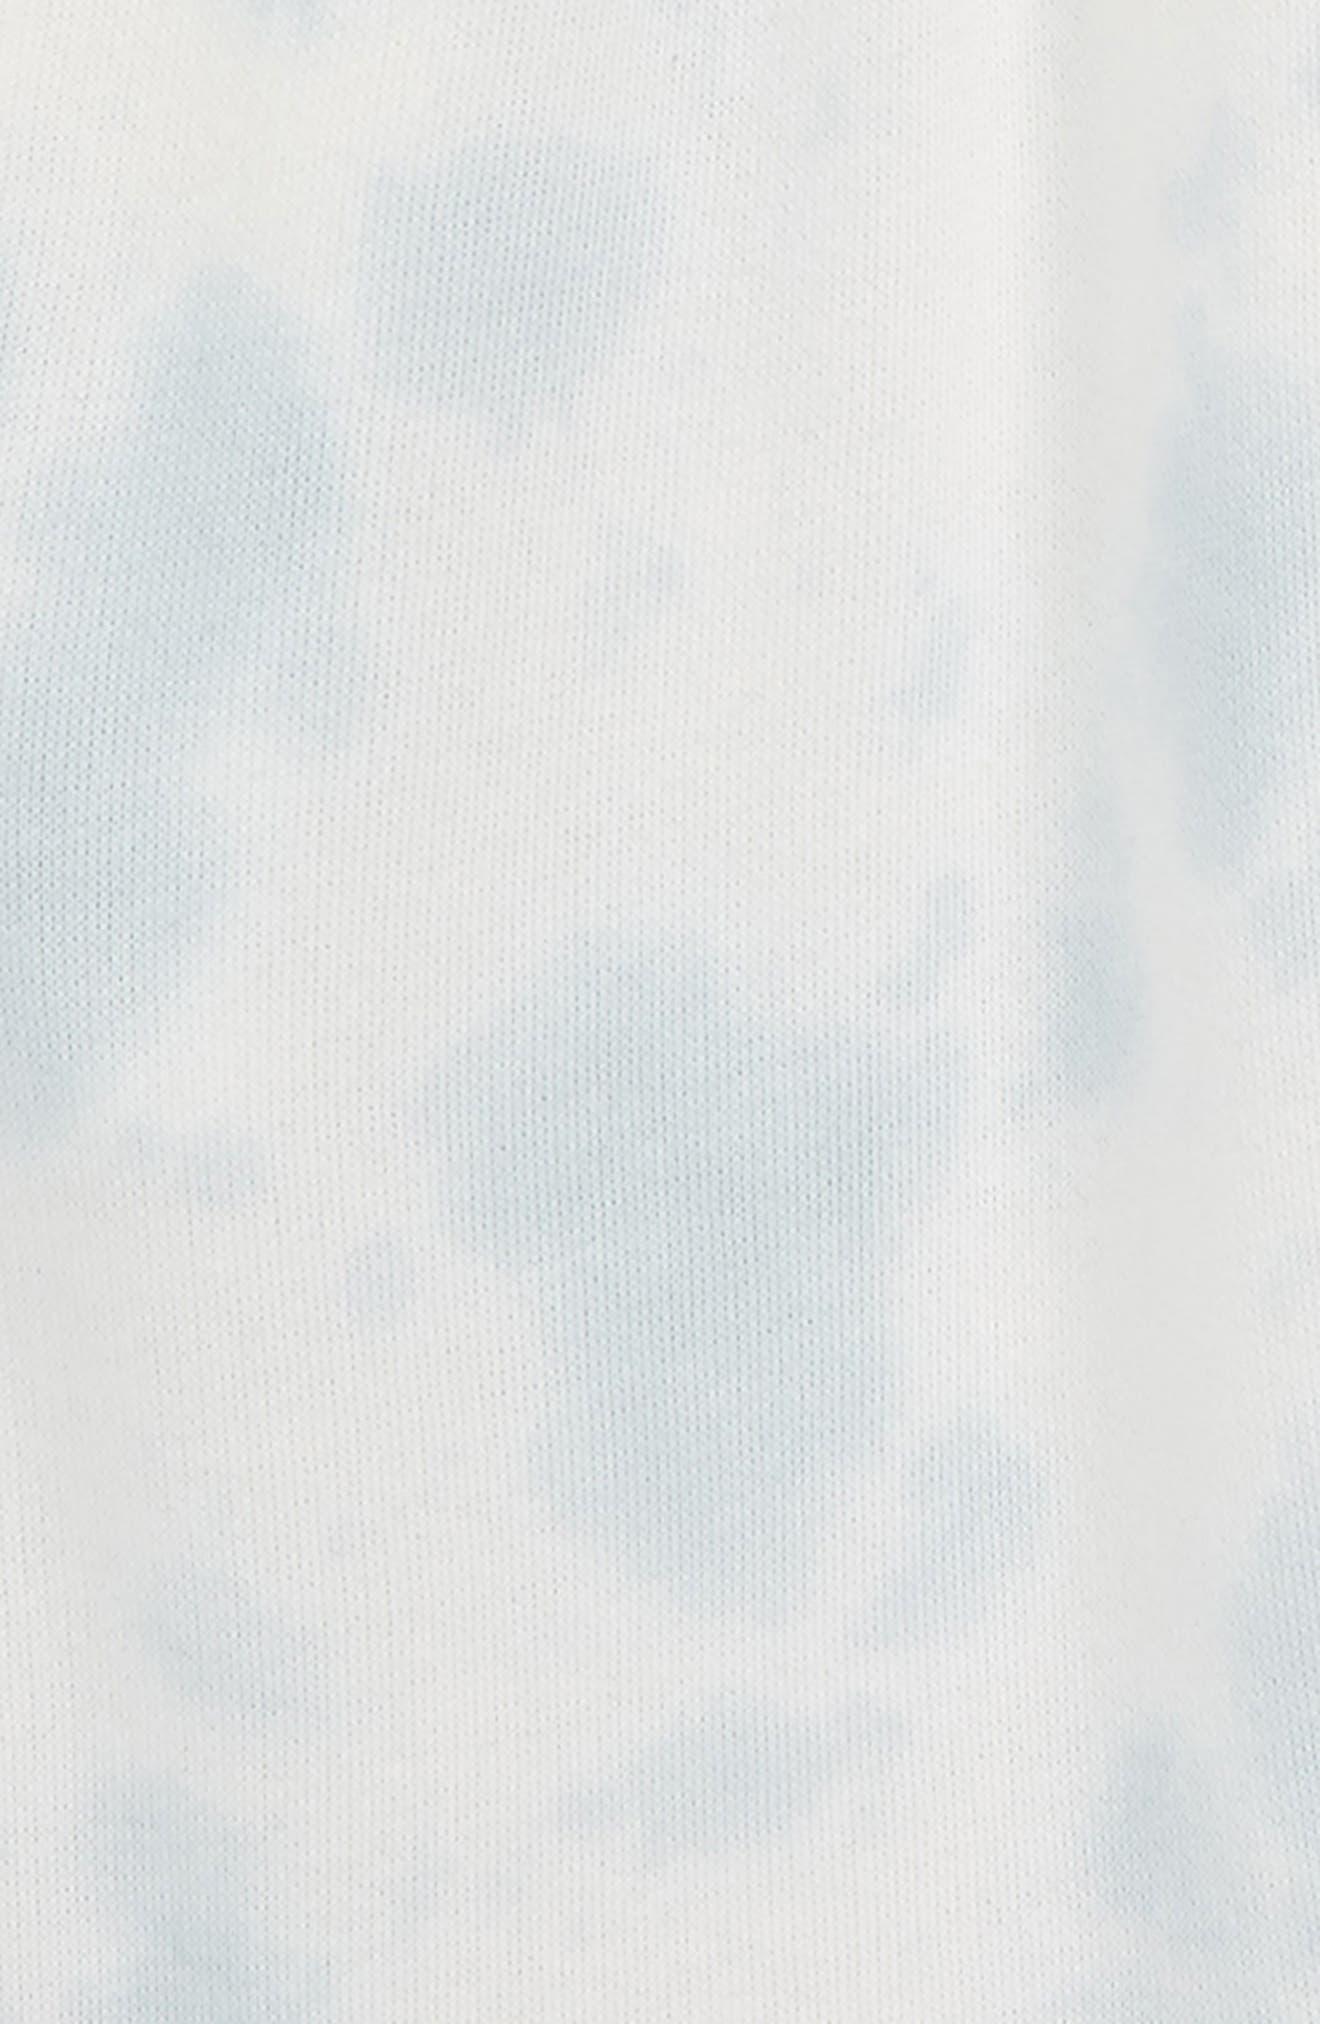 Alternate Image 2  - Stem Tie Dye Shorts (Toddler Boys, Little Boys & Big Boys)